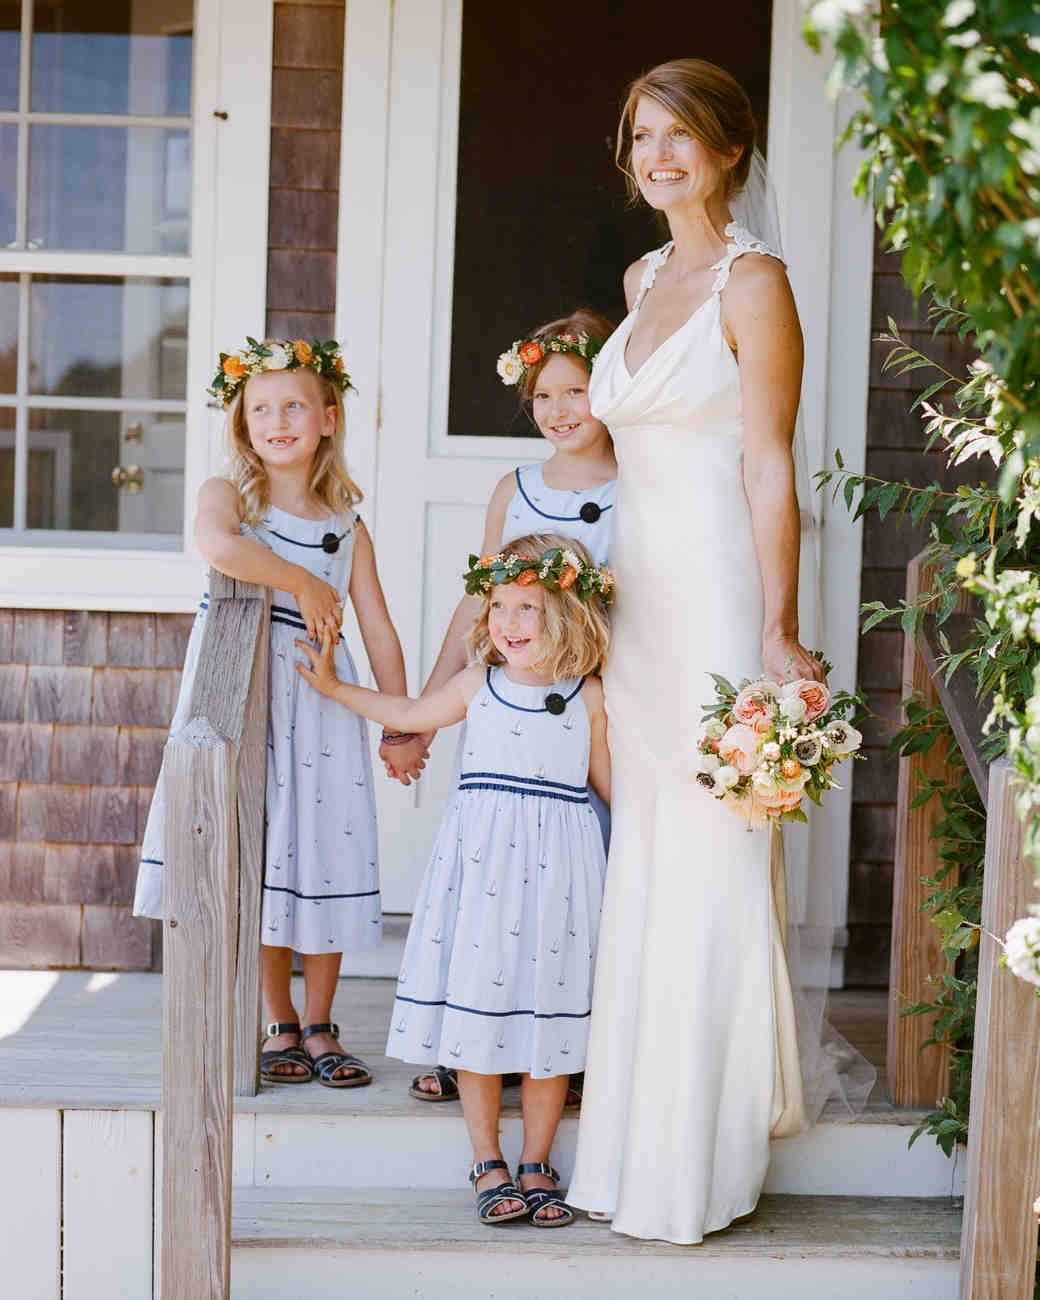 Women wearing wedding diapers - Women Wearing Wedding Diapers 56